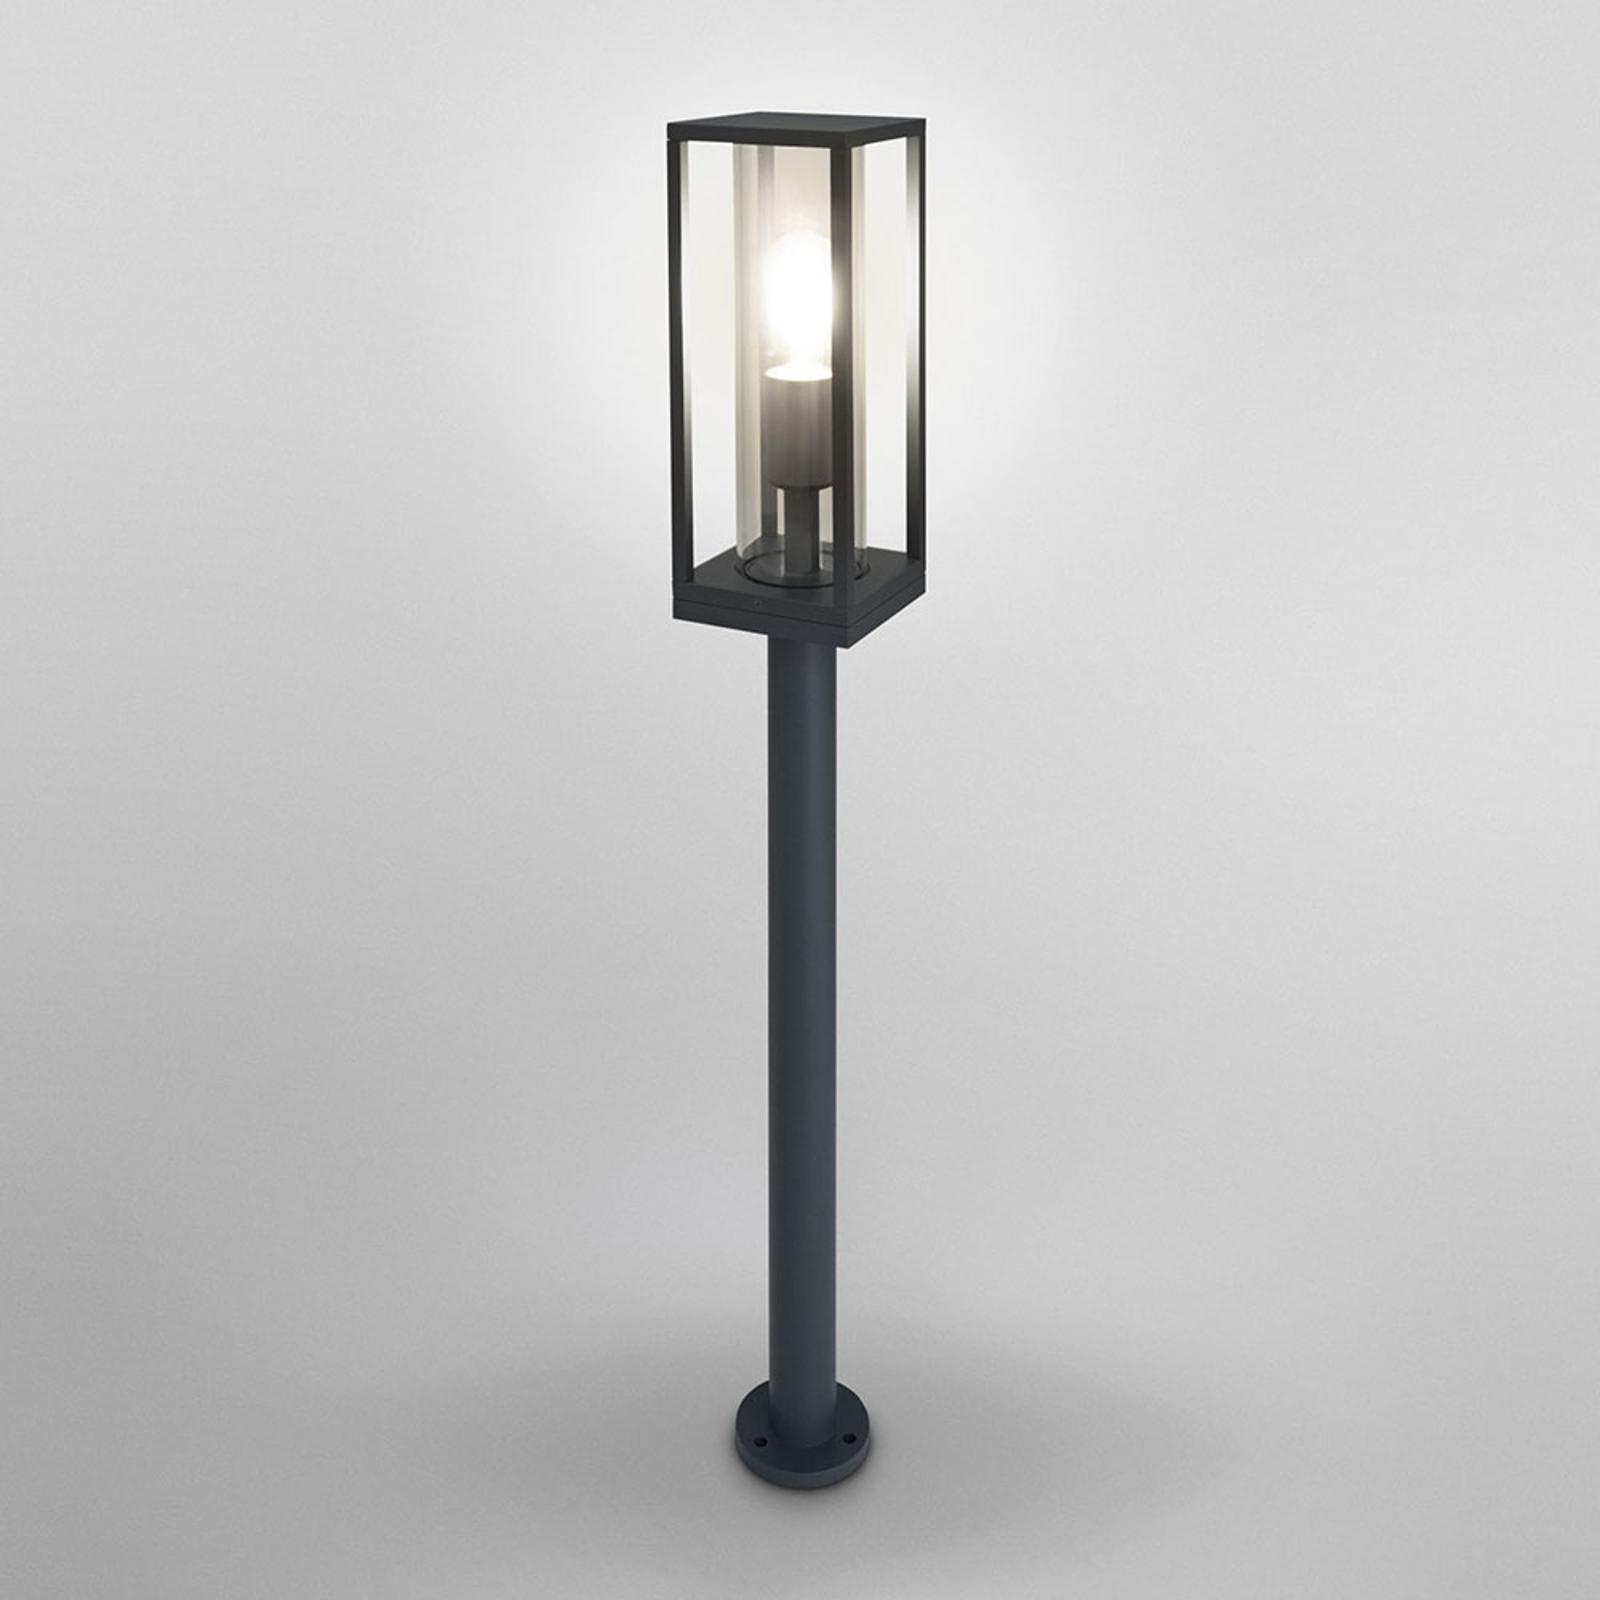 Ledvance Endura Classic Frame Wegelampe, Höhe 80cm